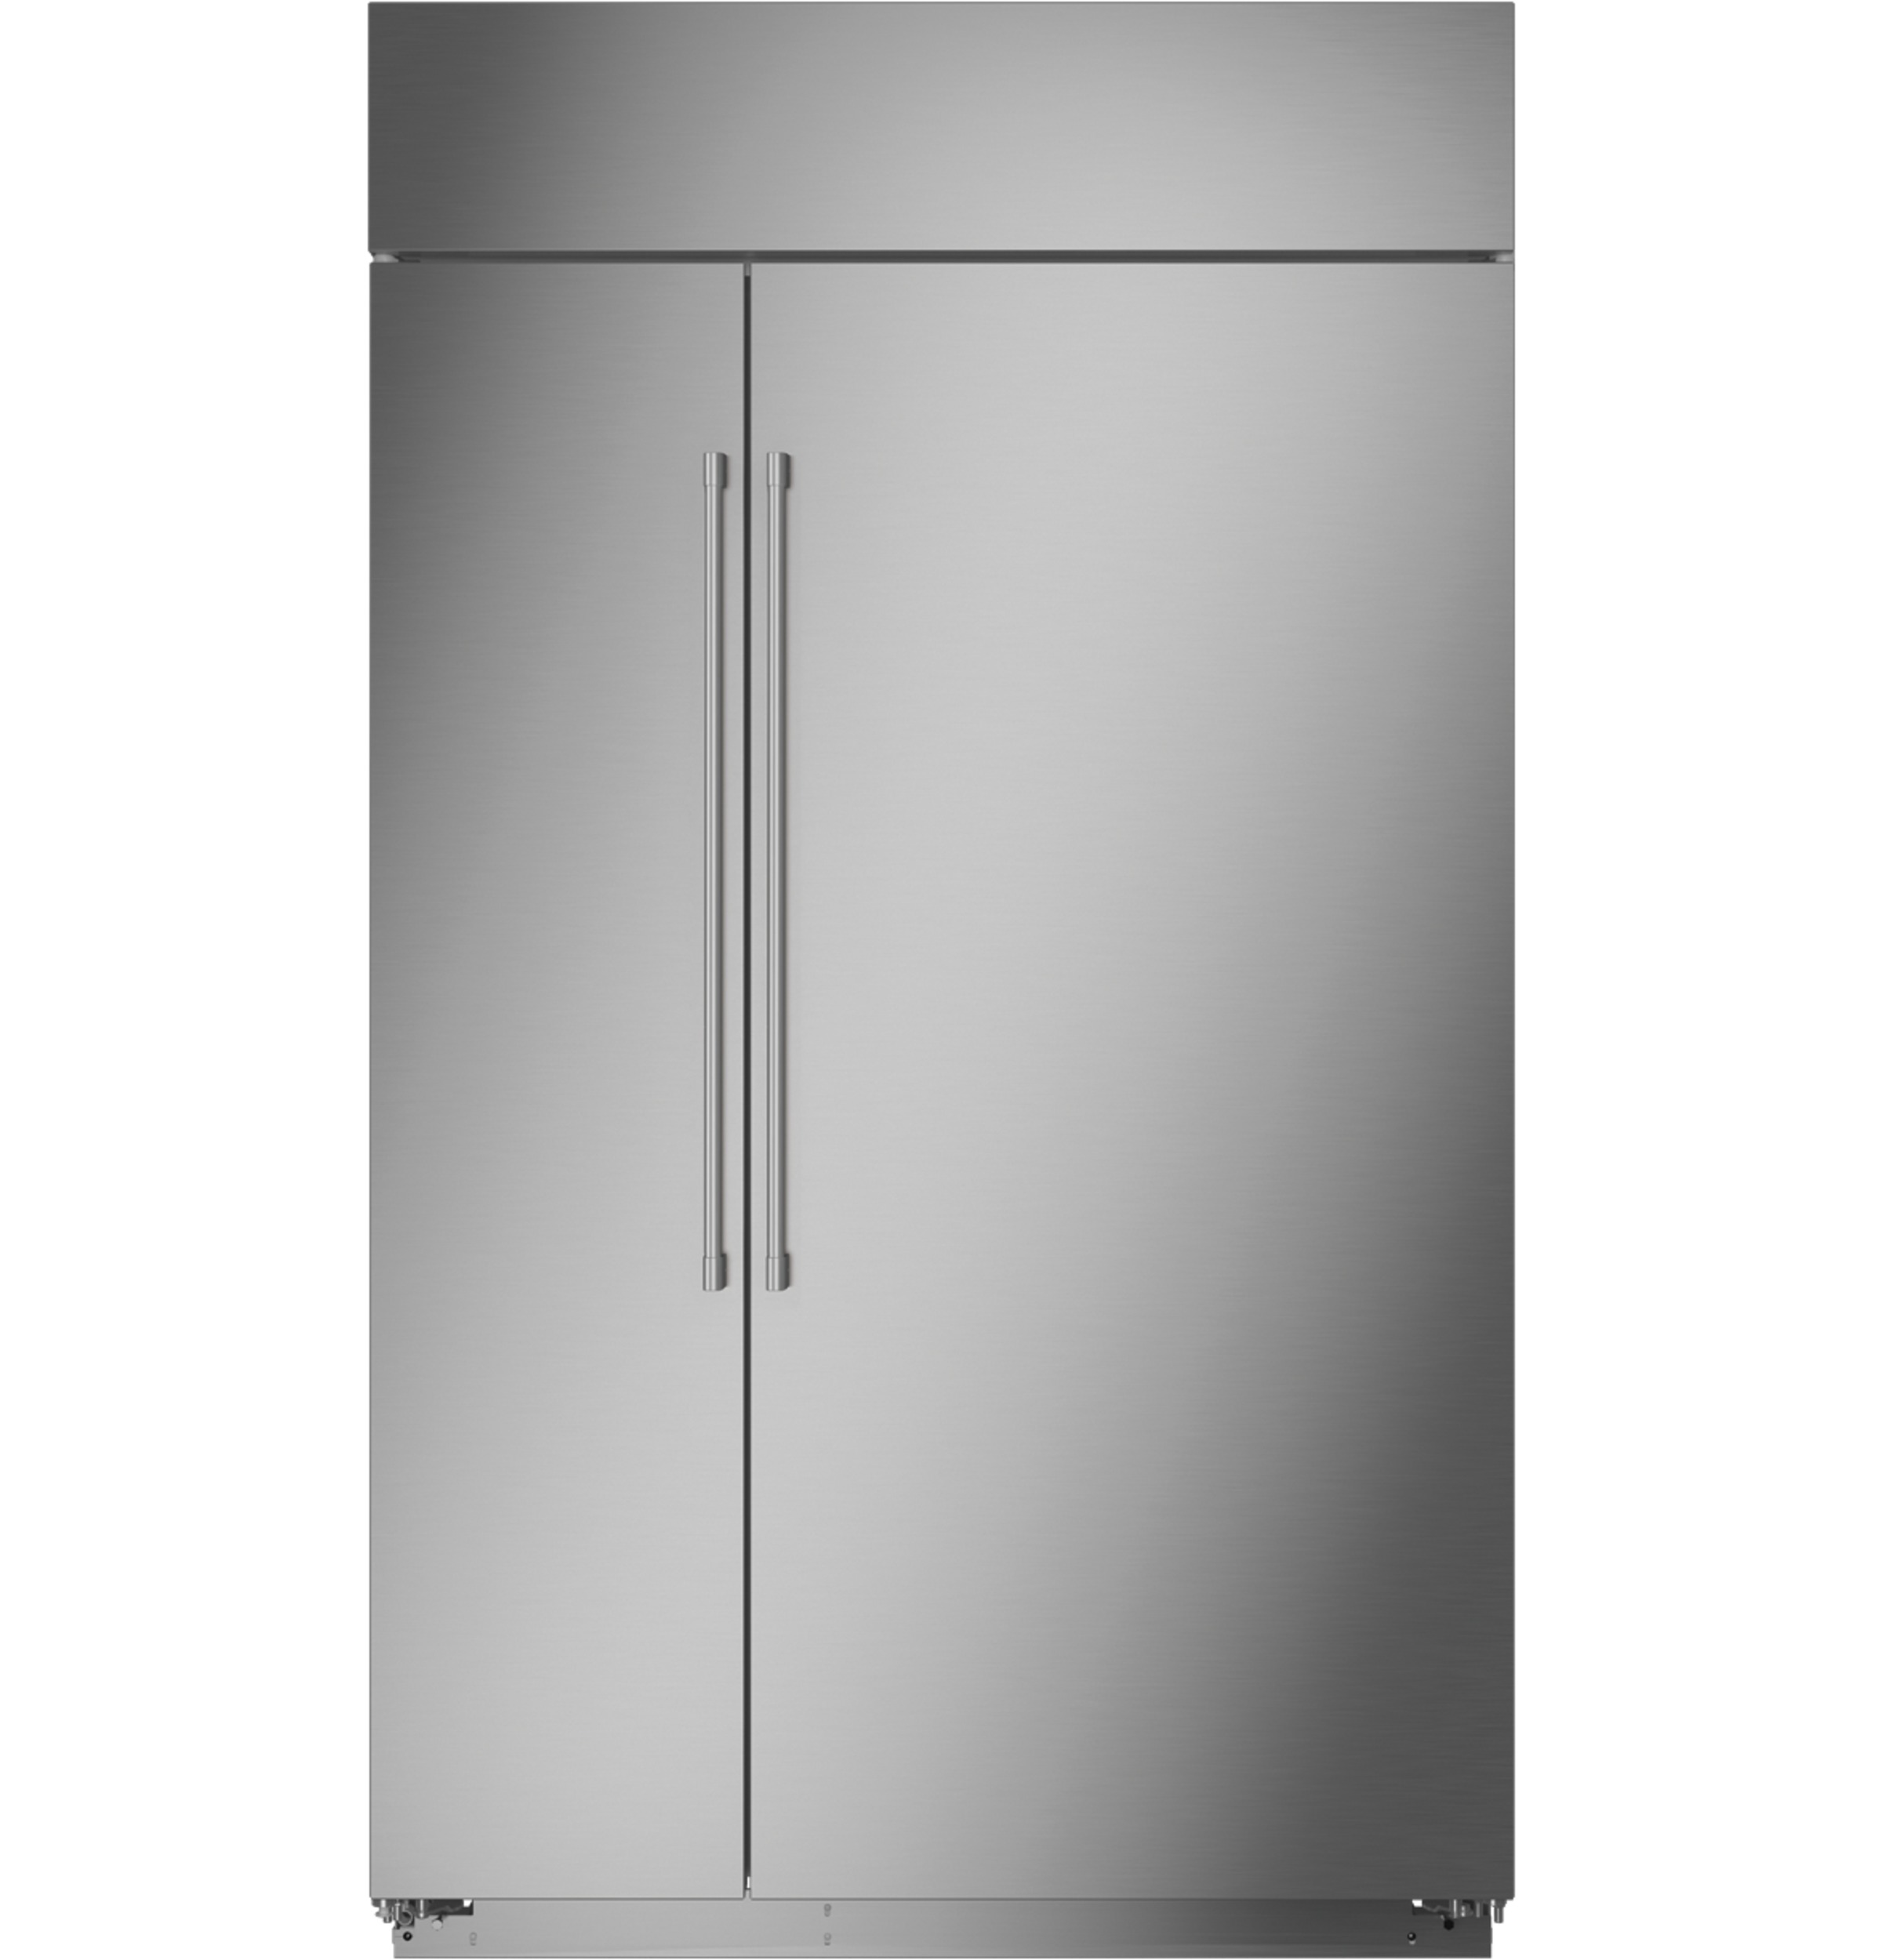 "Model: ZISS480NNSS | Monogram Monogram 48"" Smart Built-In Side-by-Side Refrigerator"